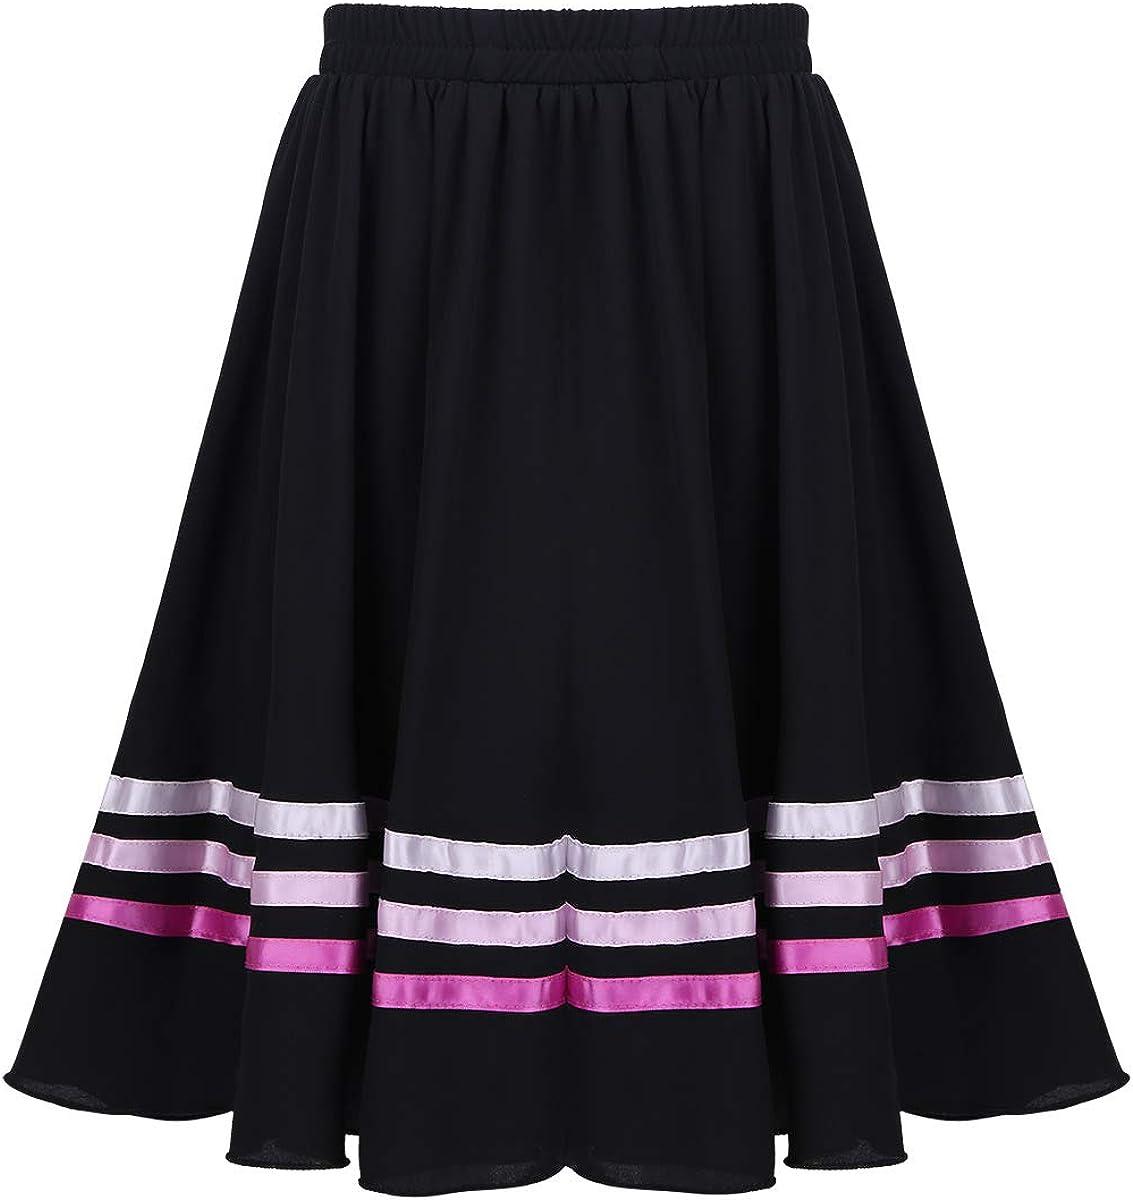 moily Big Girls Vintage Full Circle Dance Skirt Ballet Character Praise Dancewear Summer Casual Wear: Clothing